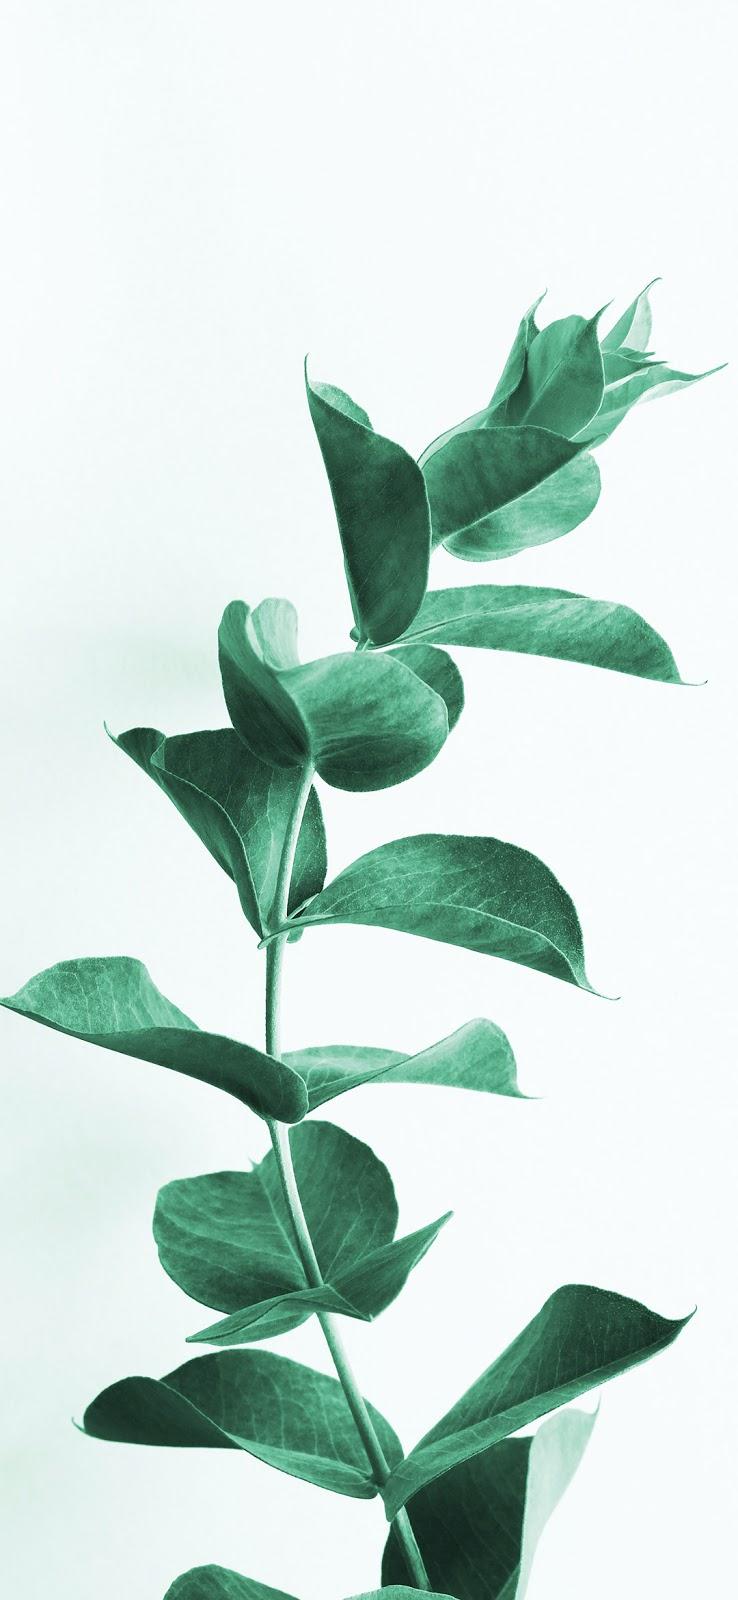 green leaf plant wallpaper